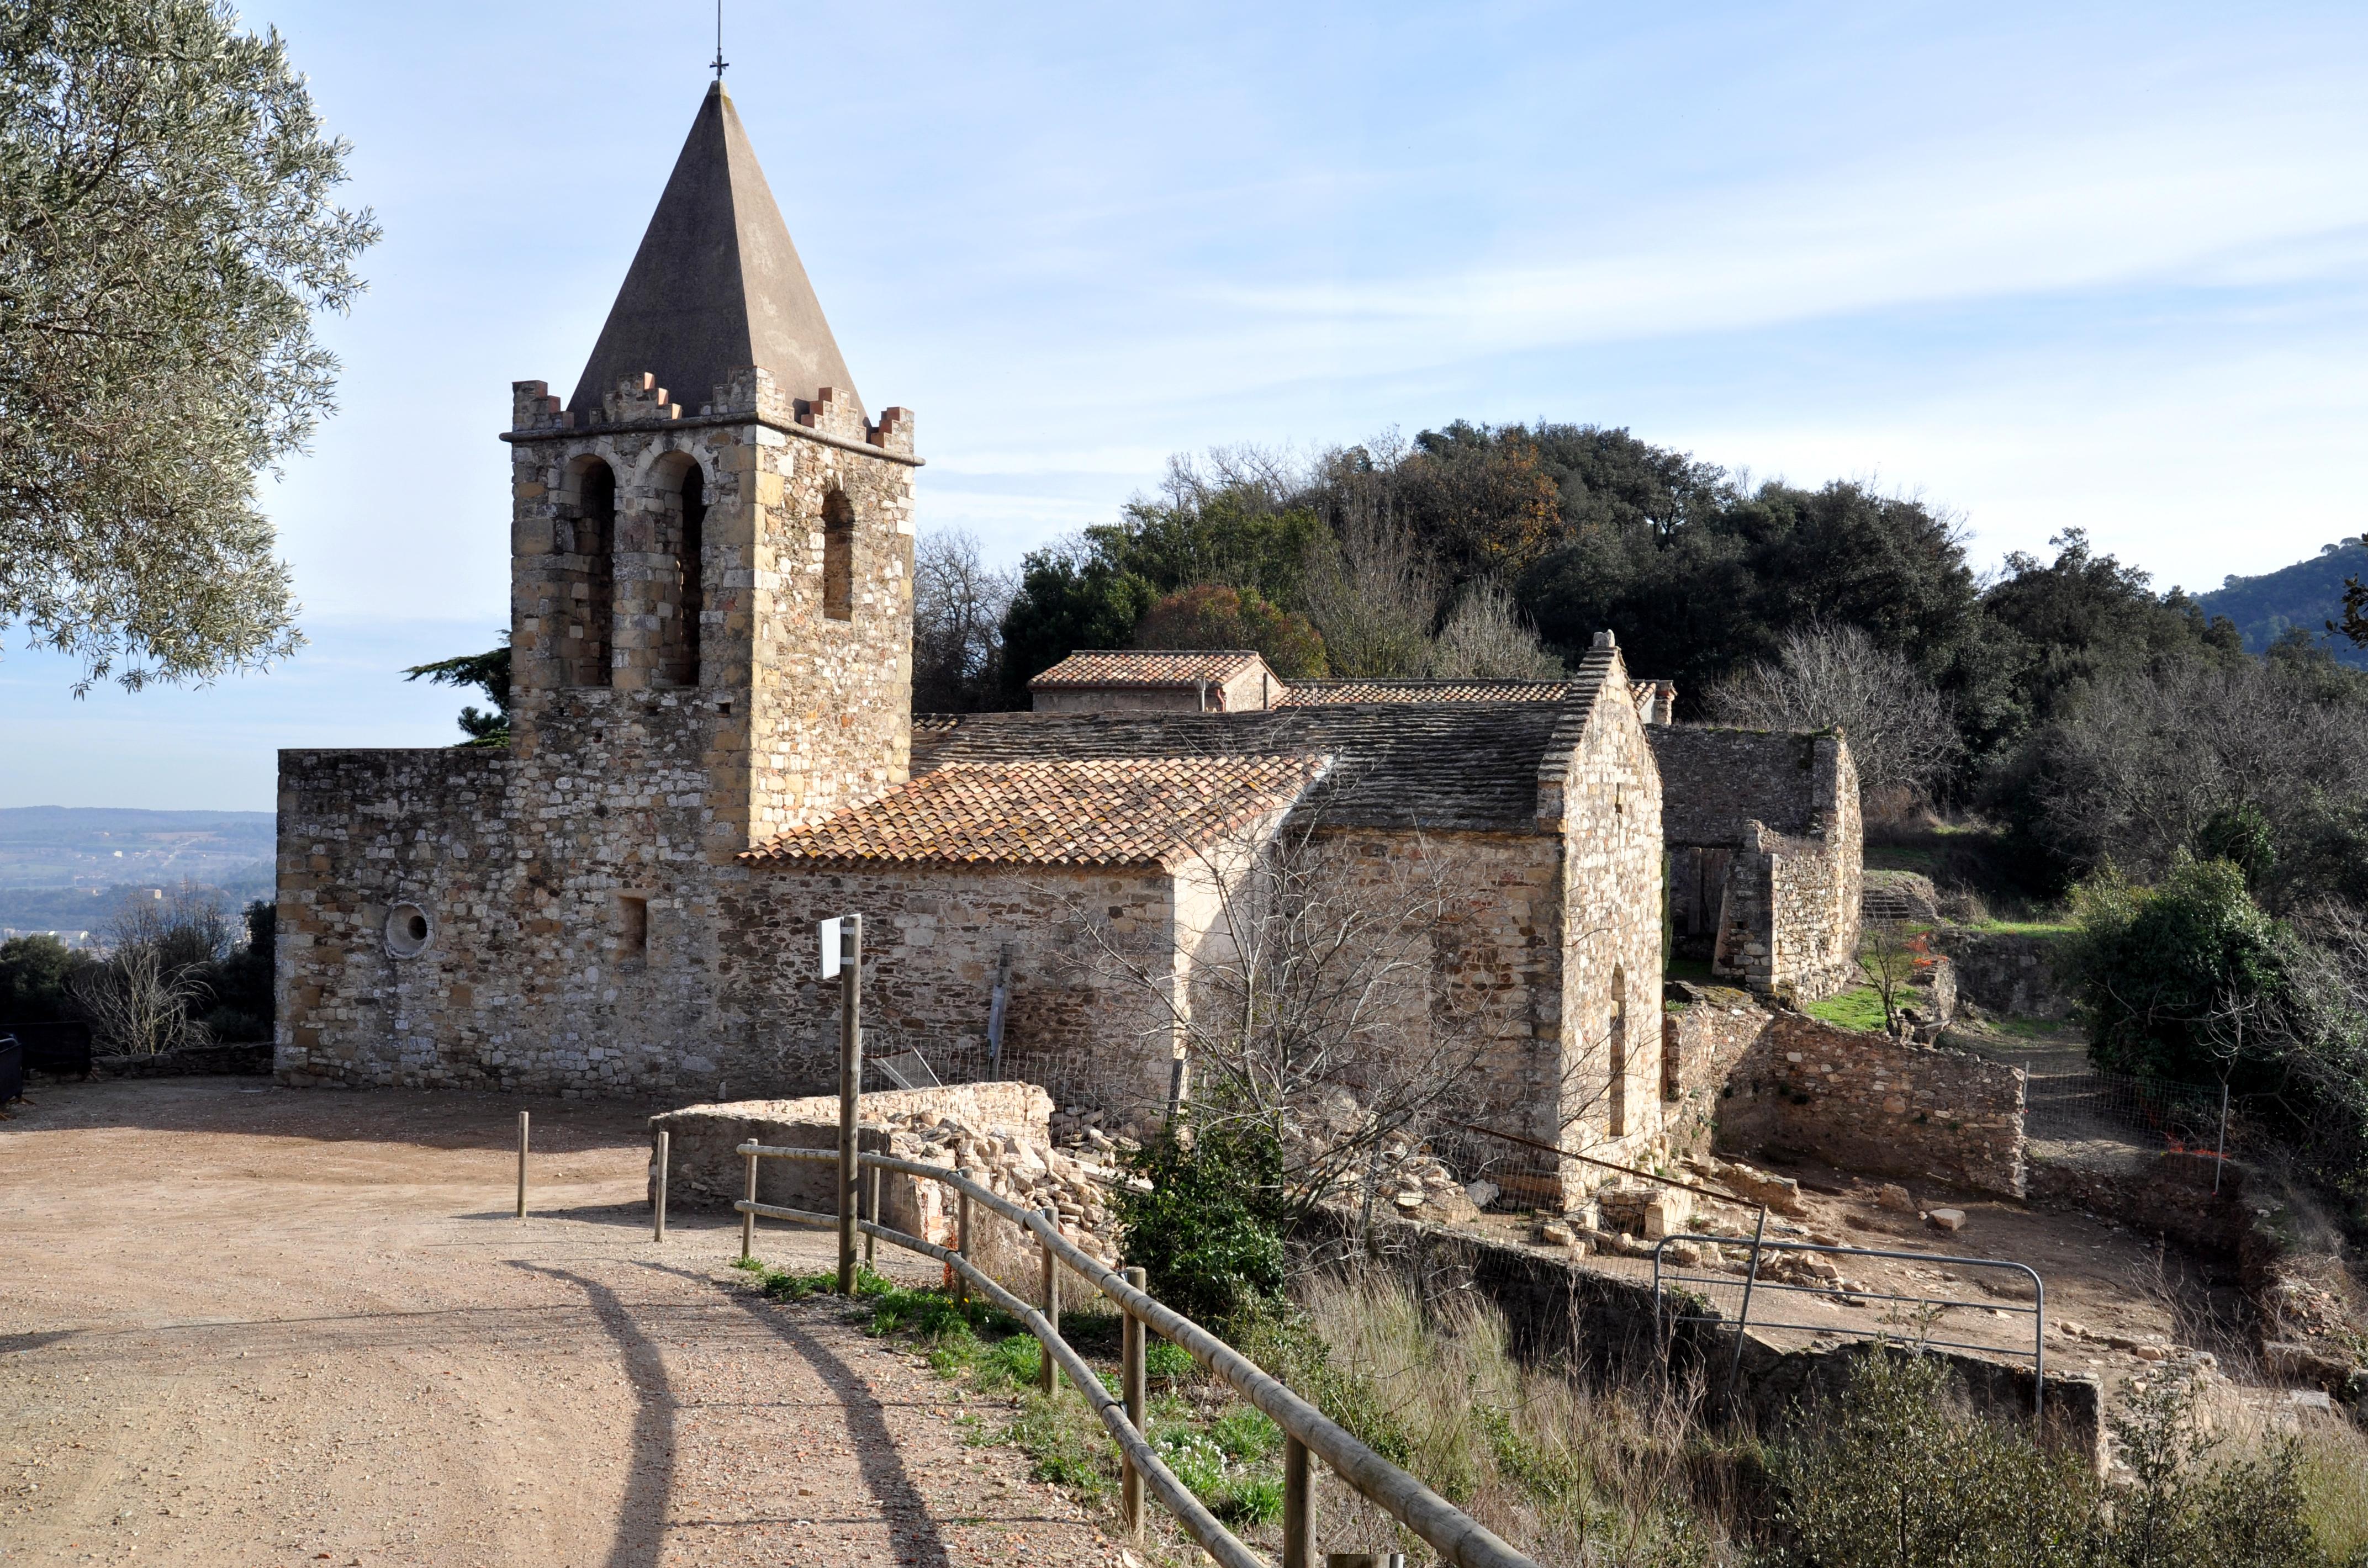 Sant_Julià_de_Ramis